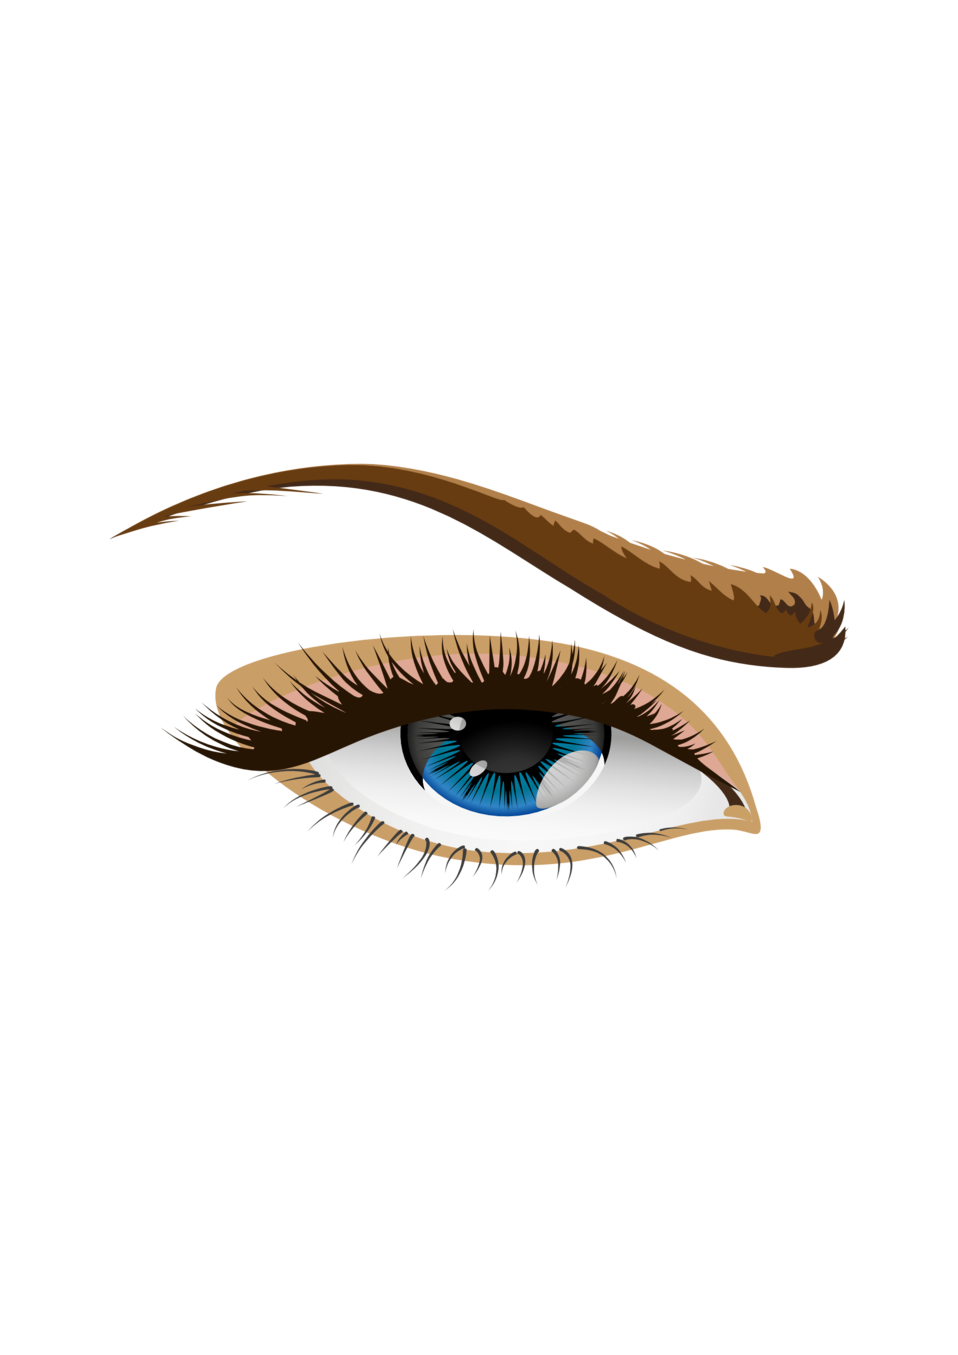 Eyelash clipart mouth. Public domain clip art